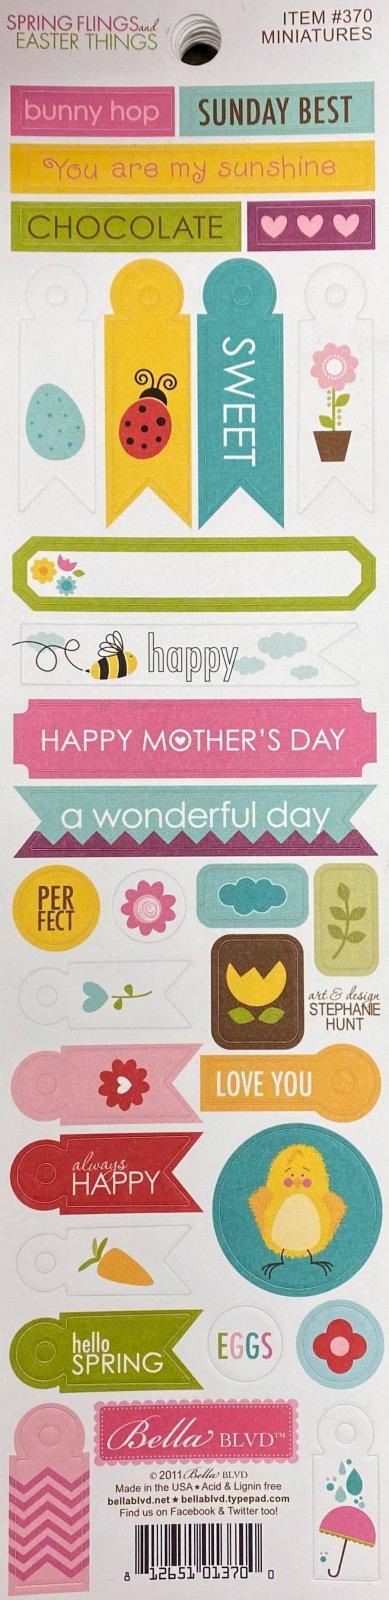 Bella Blvd - Spring Flings & Easter Things Miniature Stickers